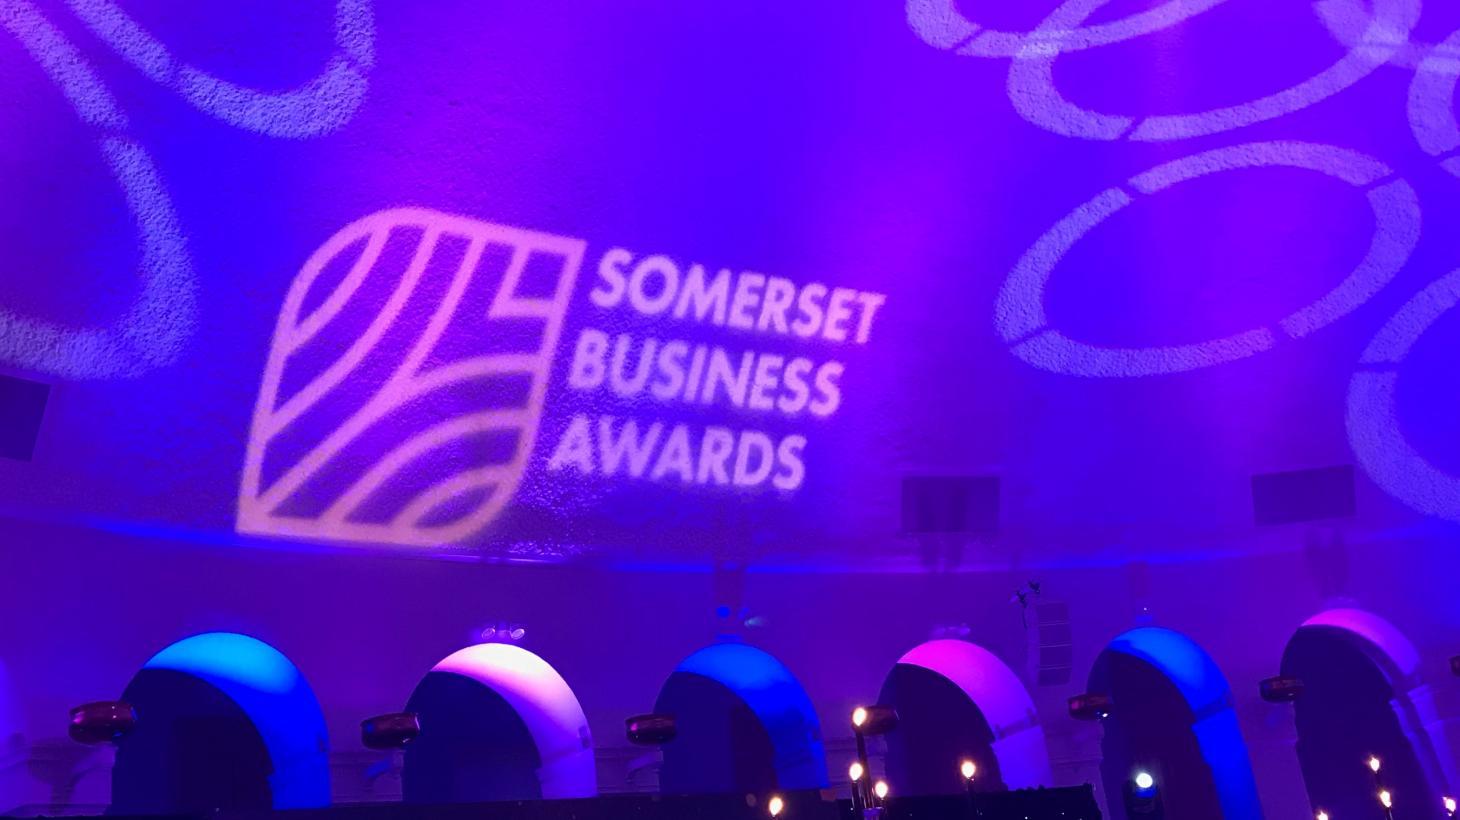 Somerset Business Awards logo